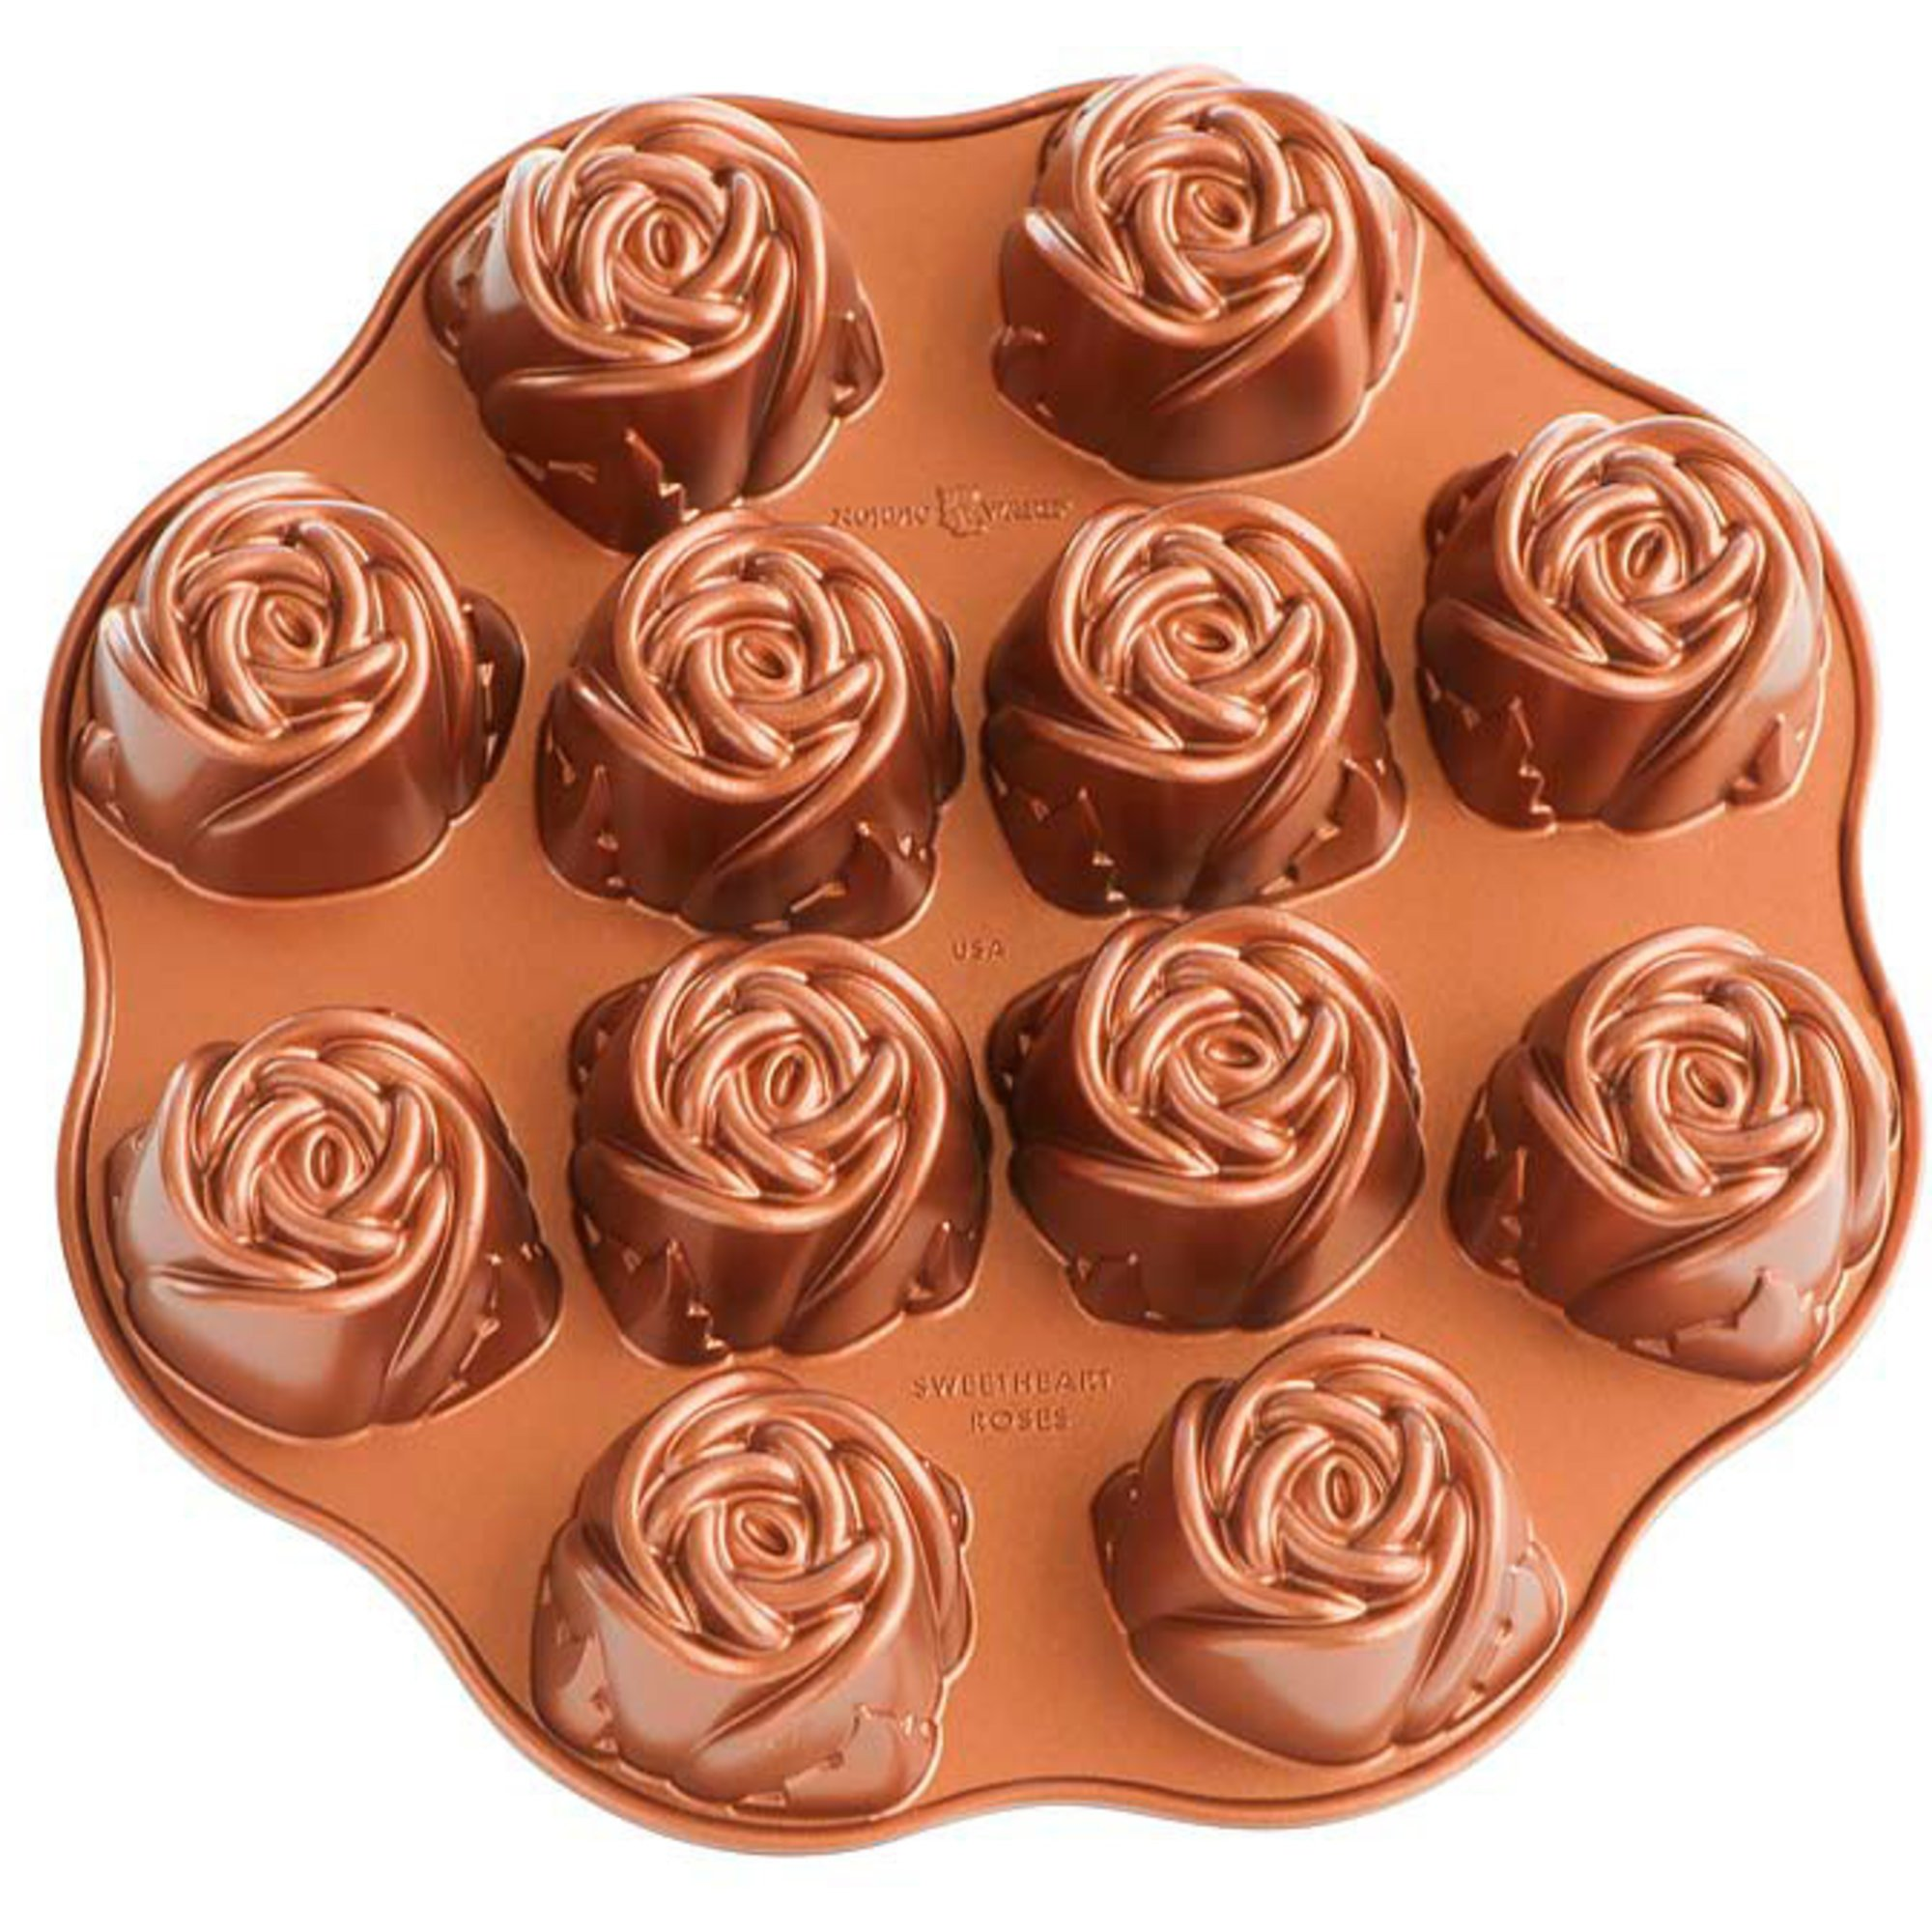 Nordic Ware Kakform Sweetheart Rose